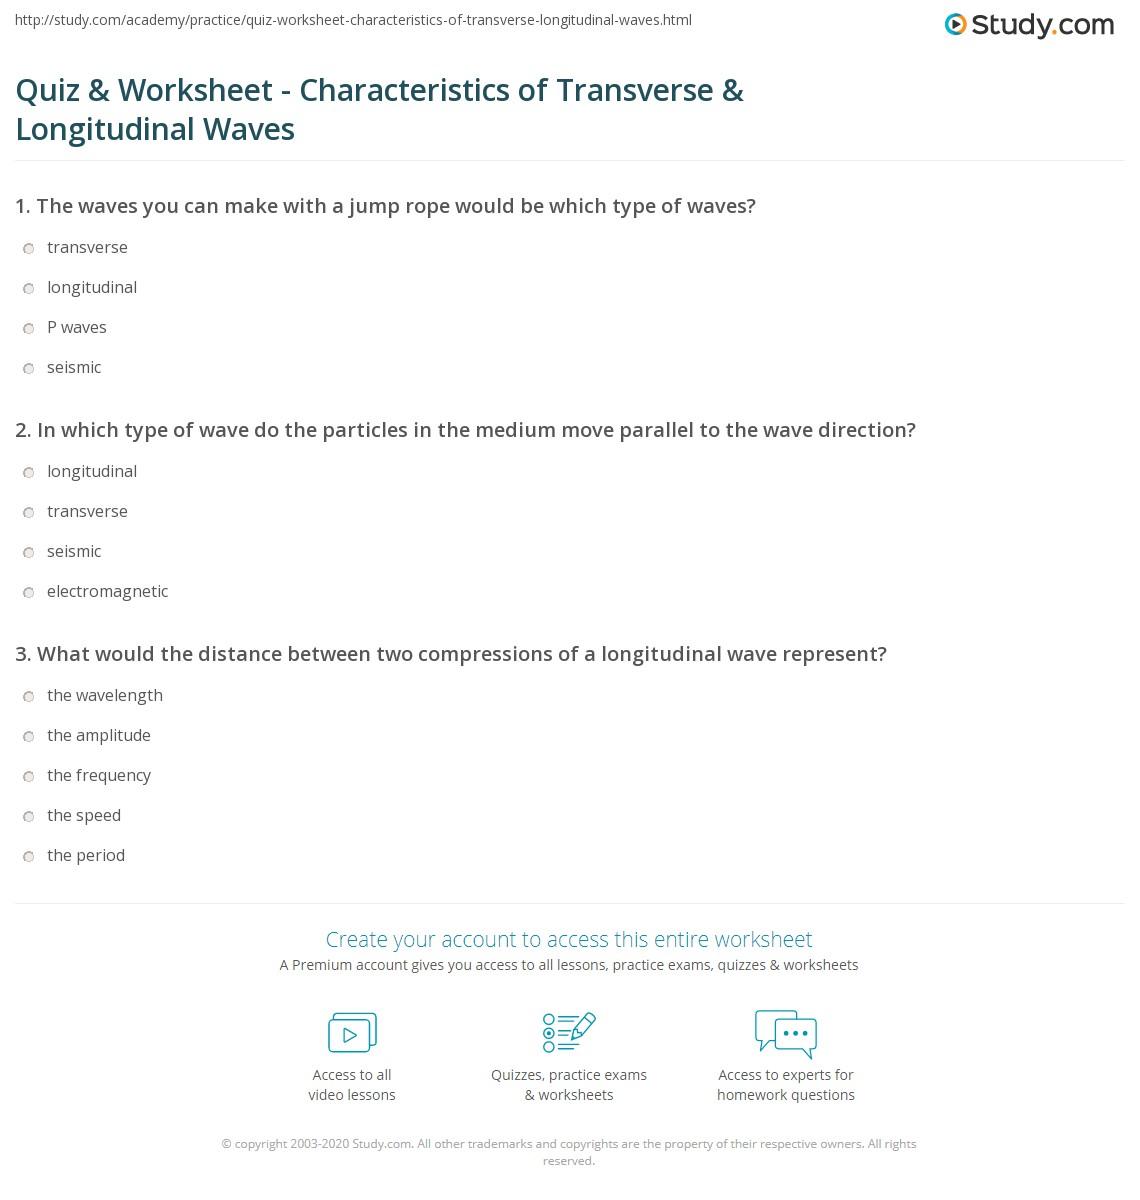 Quiz Worksheet Characteristics Of Transverse Longitudinal